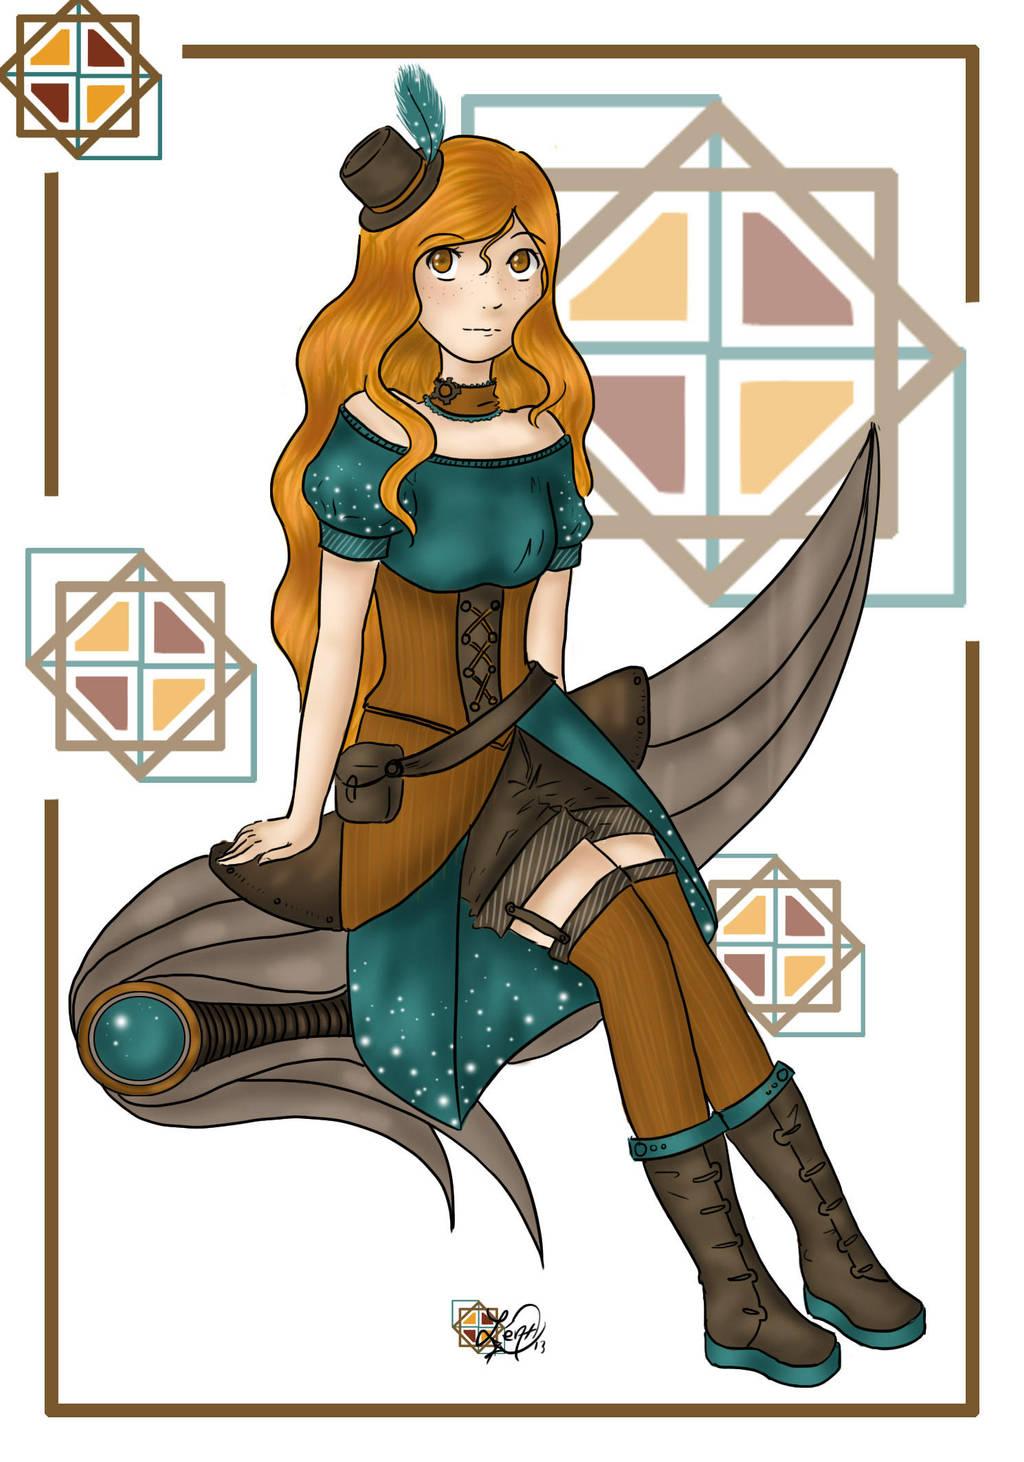 Steampunk girl by LittleStar-Fish